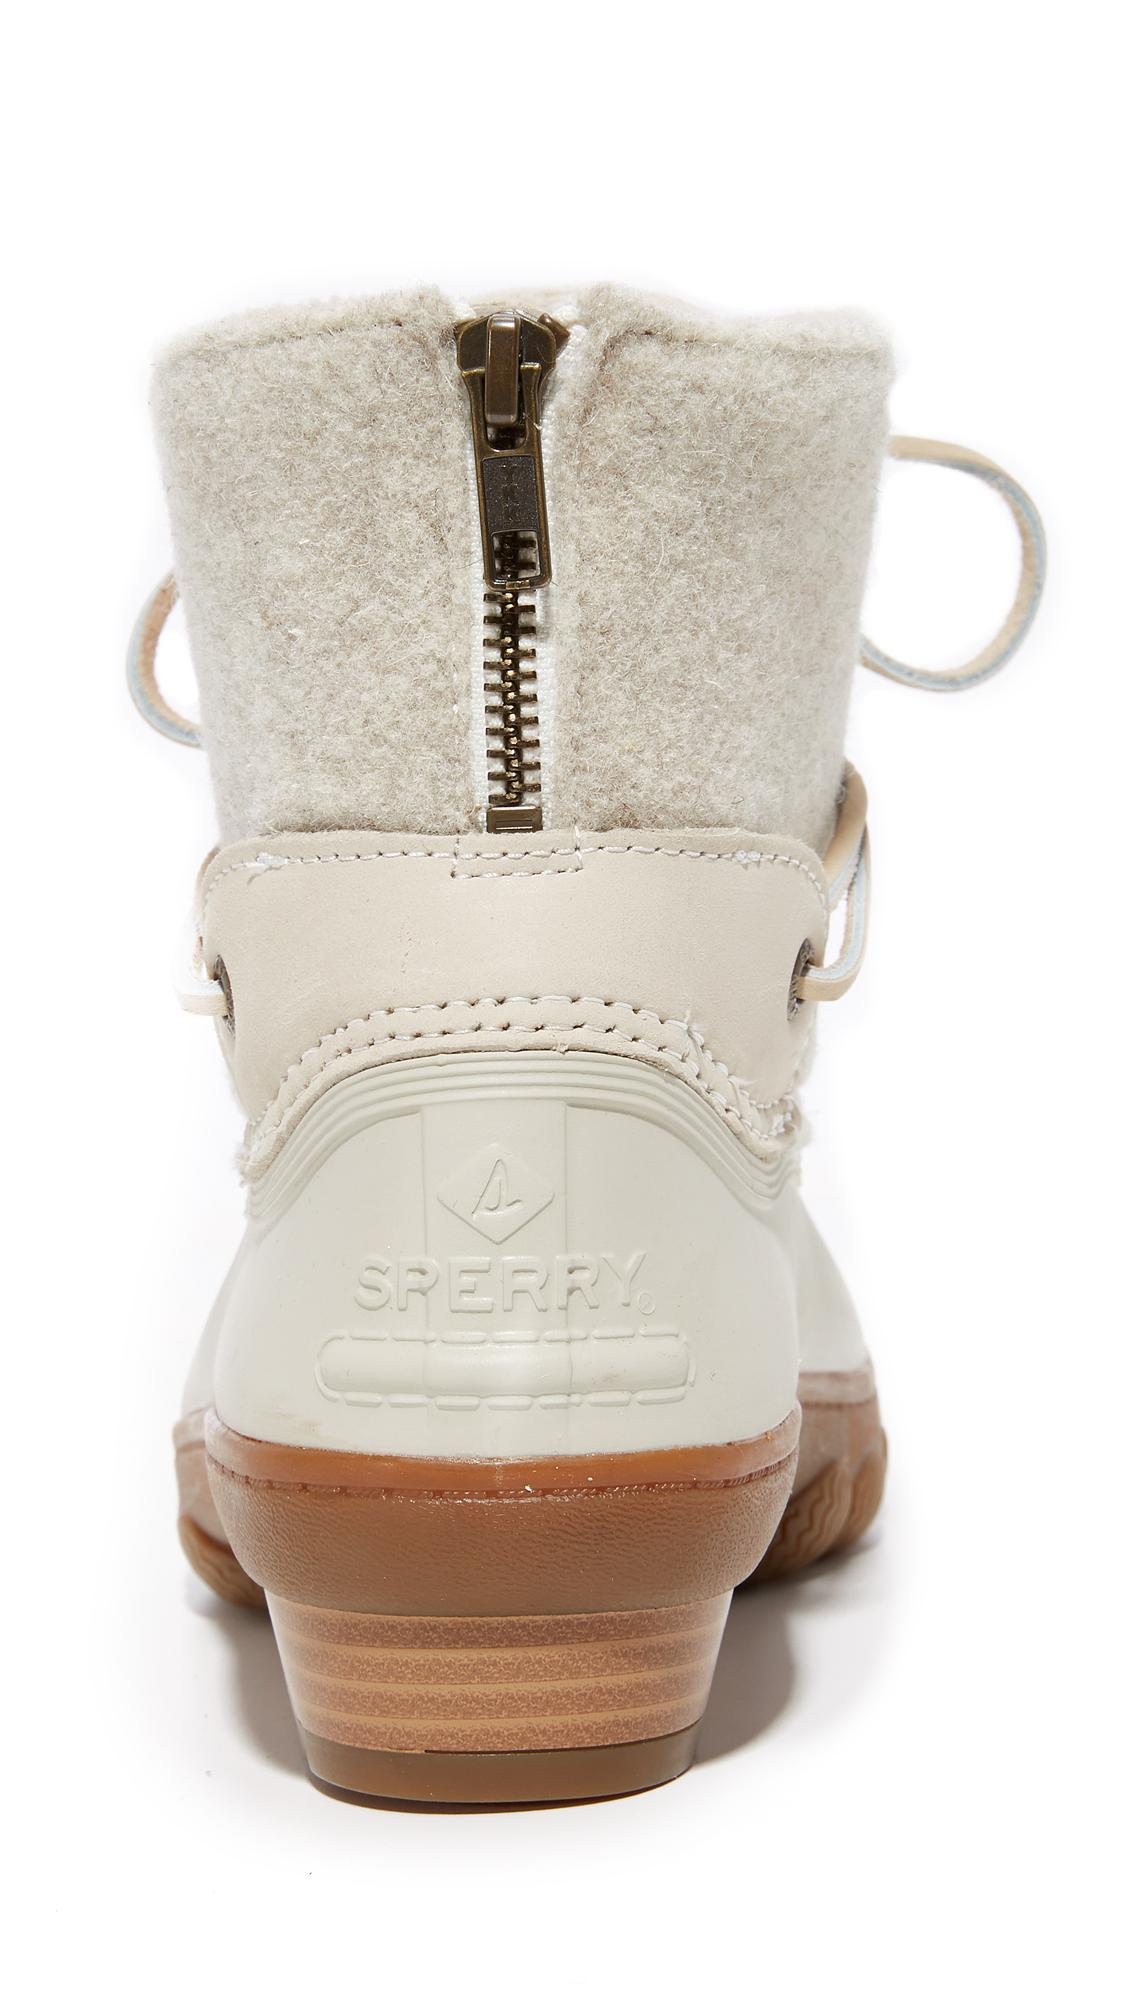 5c67d0161fb0 Lyst - Sperry Top-Sider Saltwater Wedge Tide Wool Booties in White